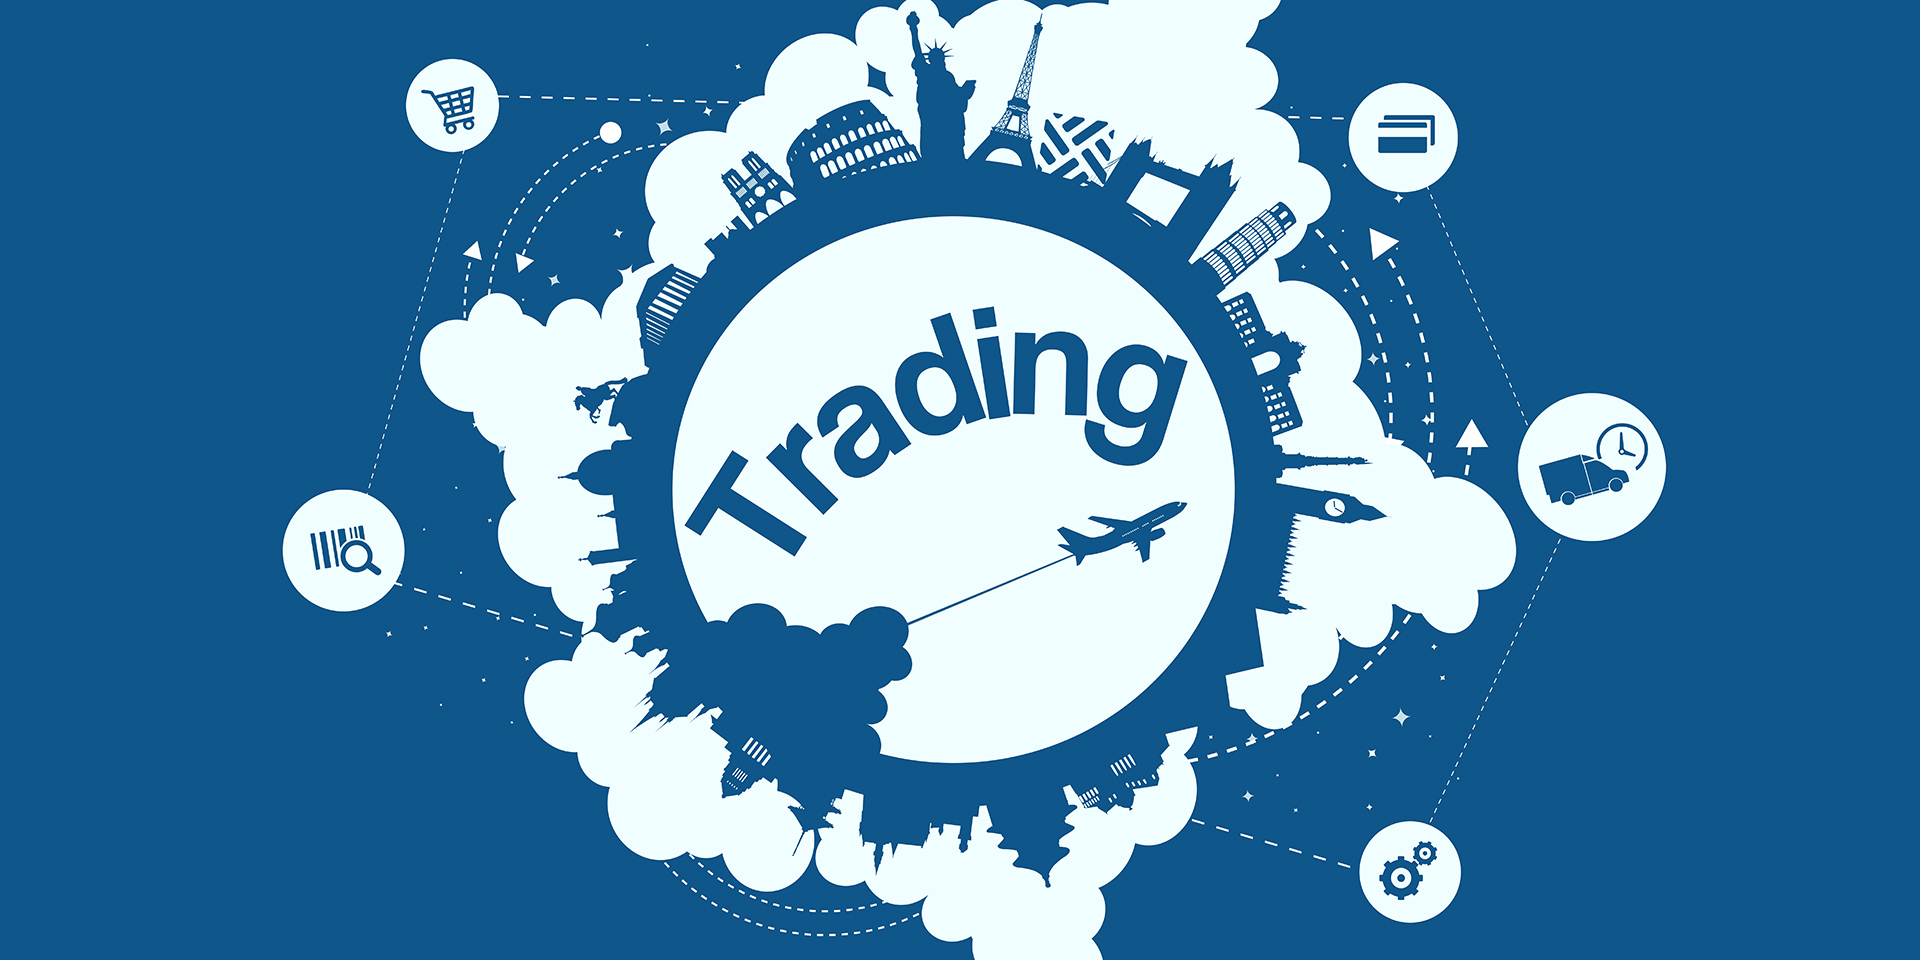 MSc Finance and Global Trading